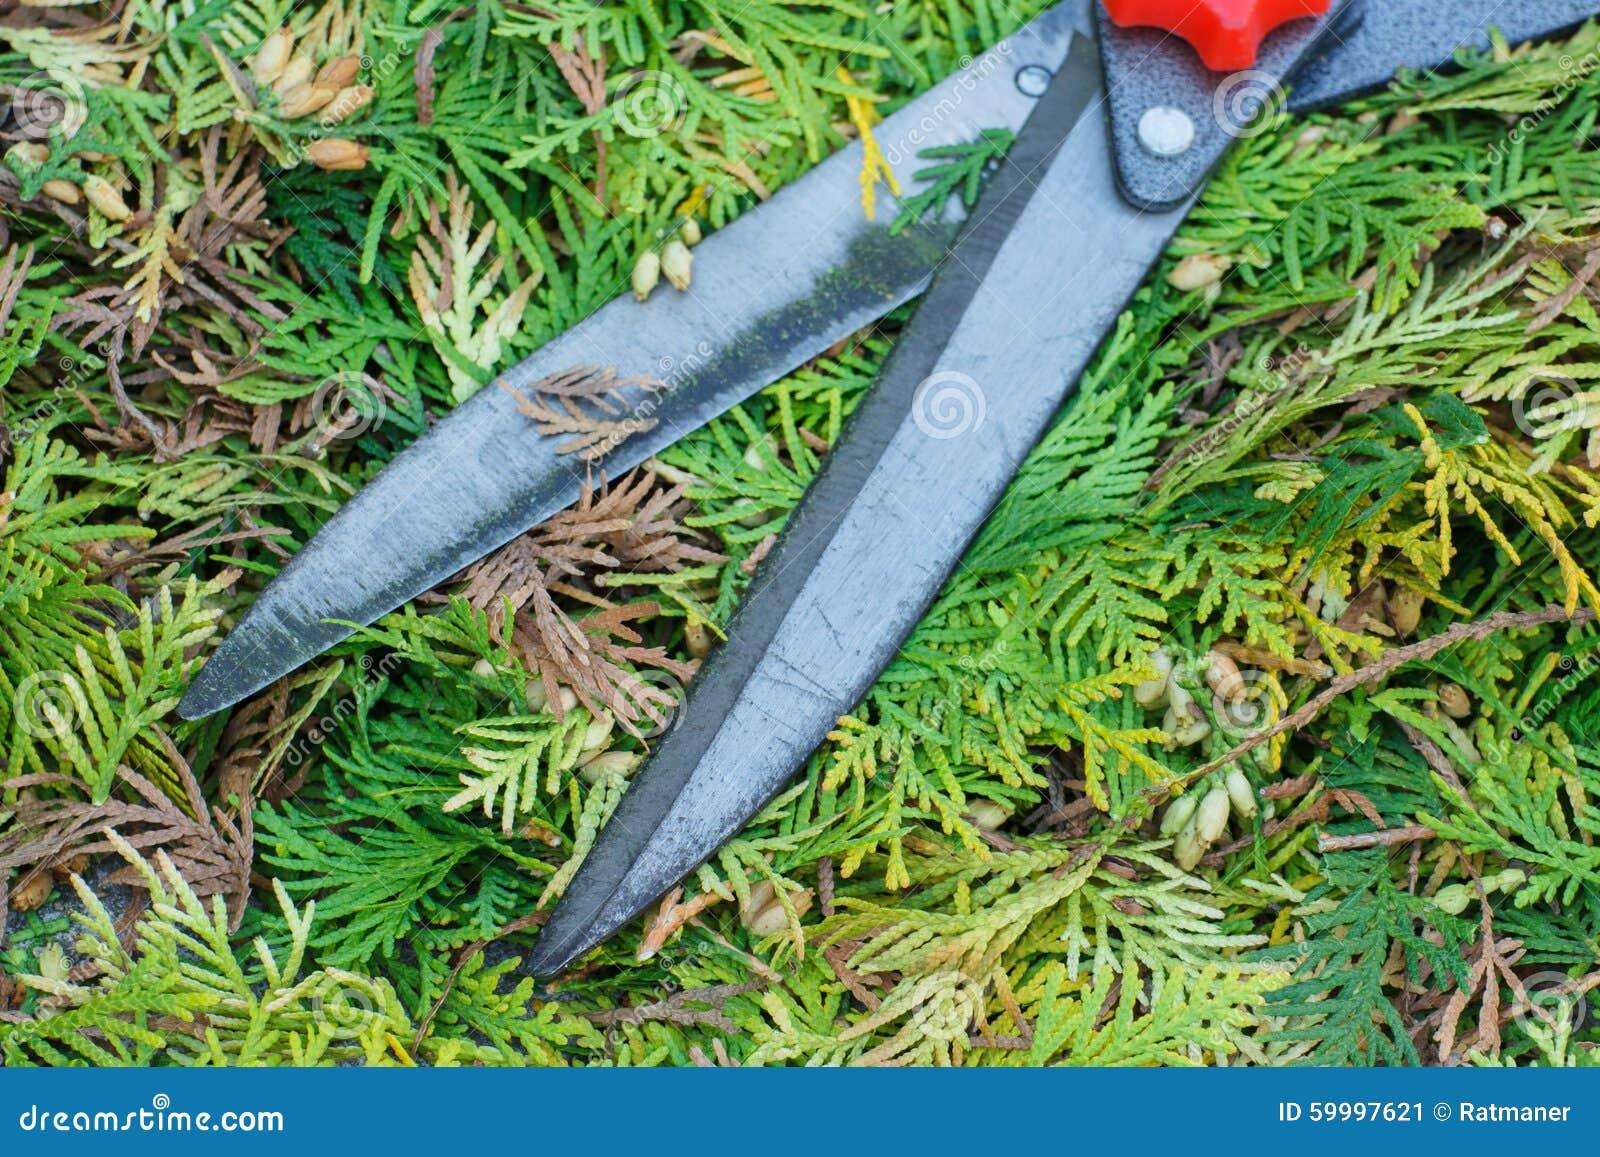 Gardening tool to trim bushes seasonal trimmed bushes for Gardeners trimming tool